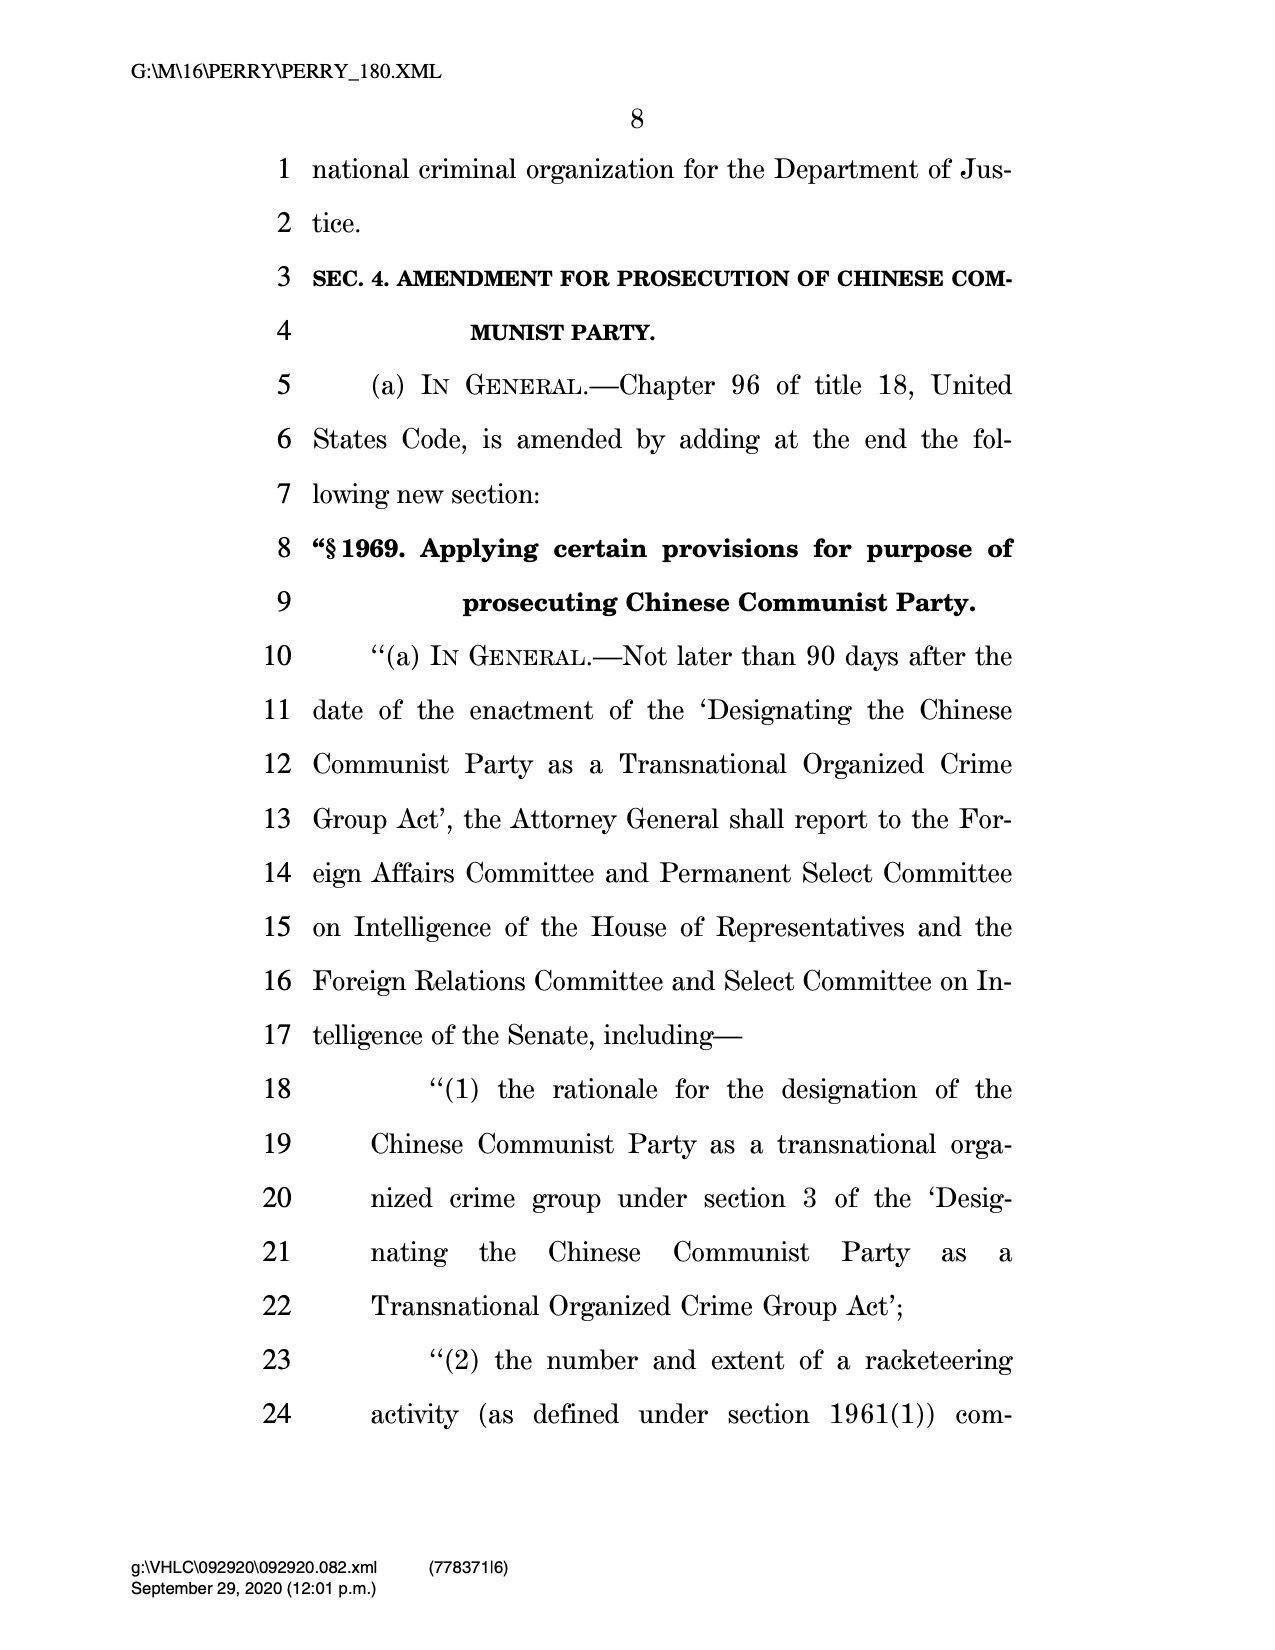 CCP as a TOC Bill - Final Edition8.jpg